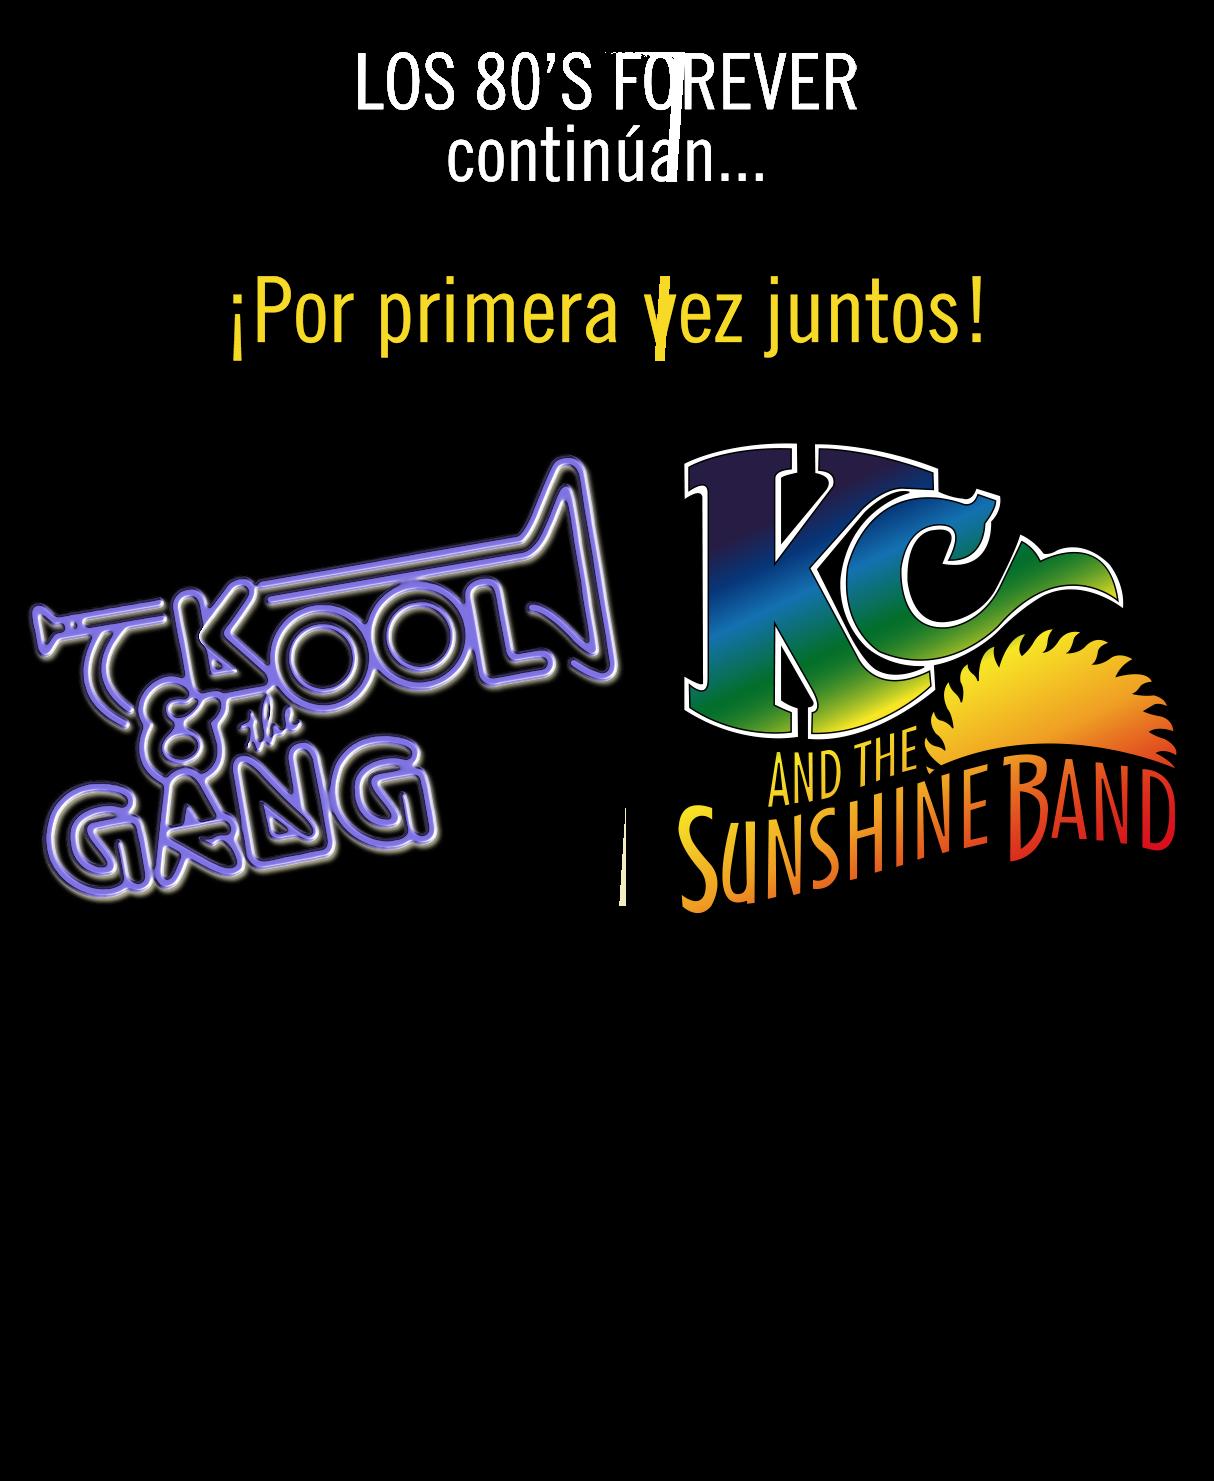 KC & The Sunshine Band + Kool & The Gang en Chile en Movistar Arena. ¡Reserva ahora tu entrada!